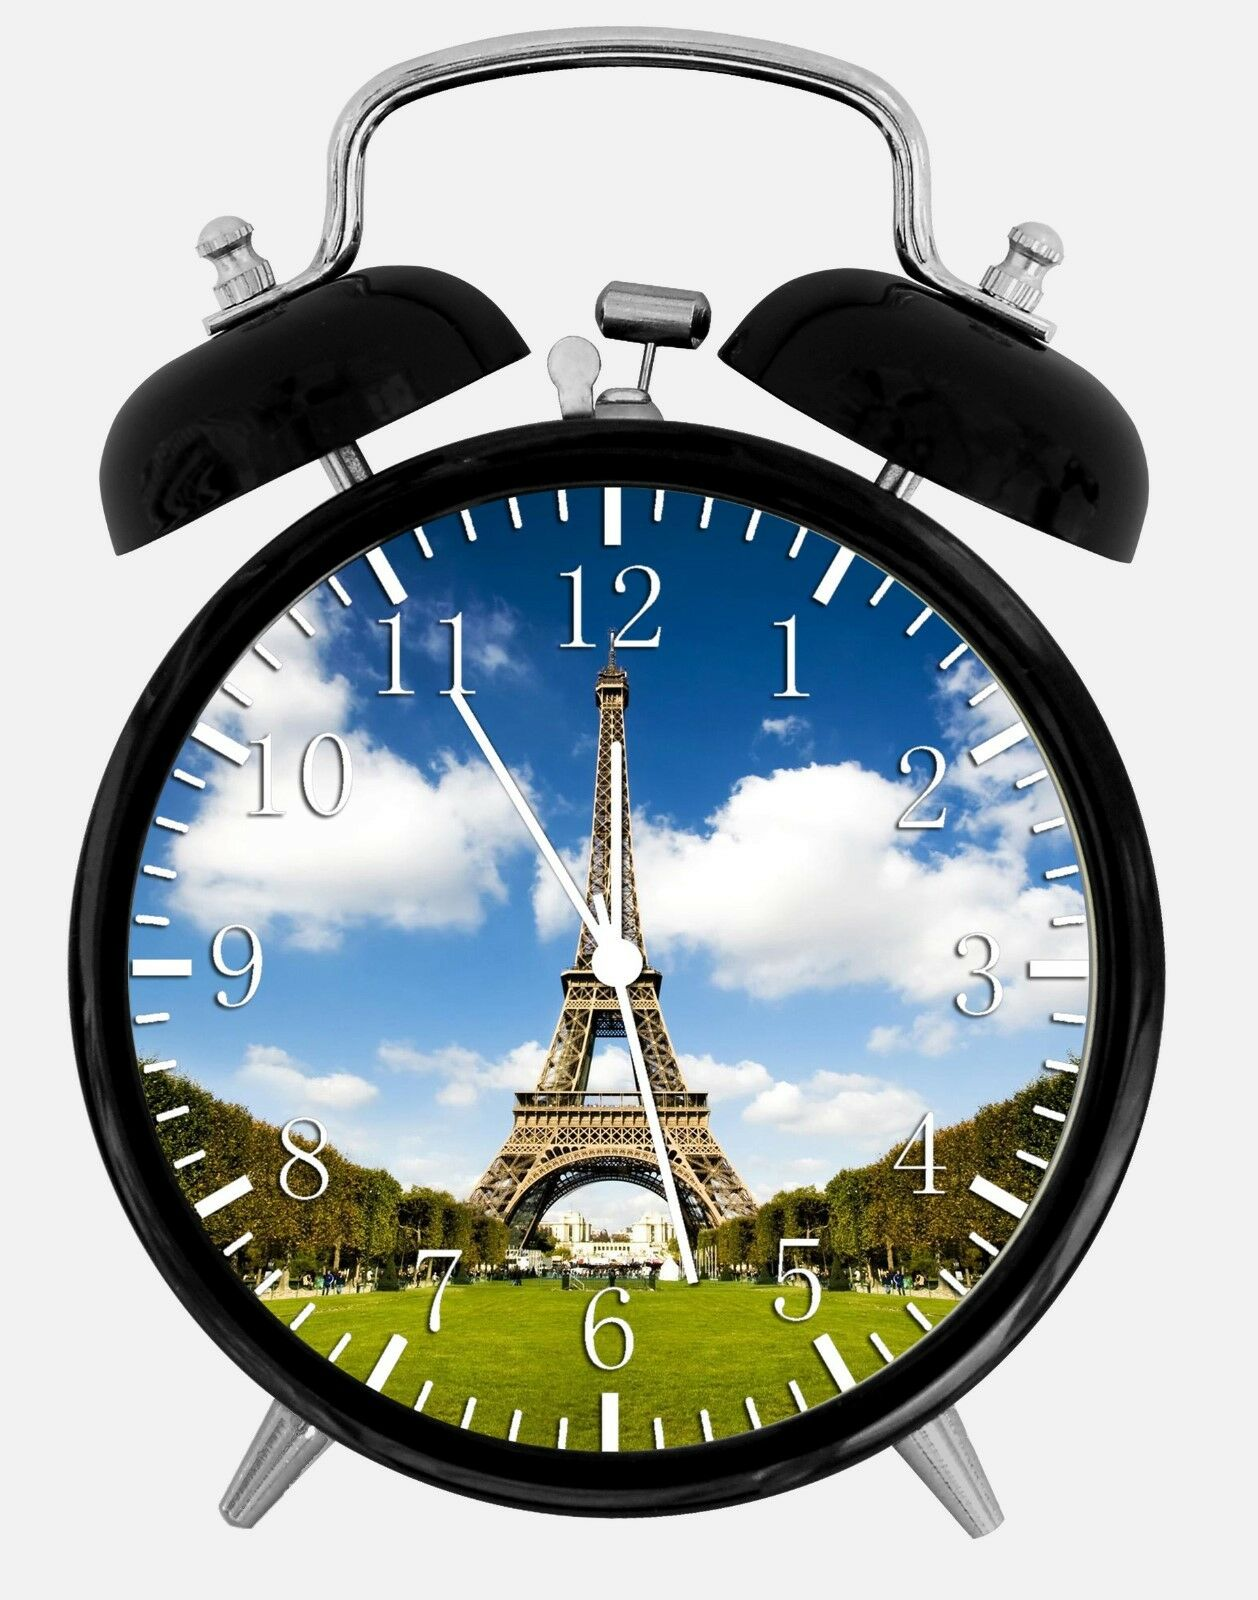 "Eiffel Tower Alarm Desk Clock 3.75"" Room Office Decor W03 Will Be a Nice Gift"